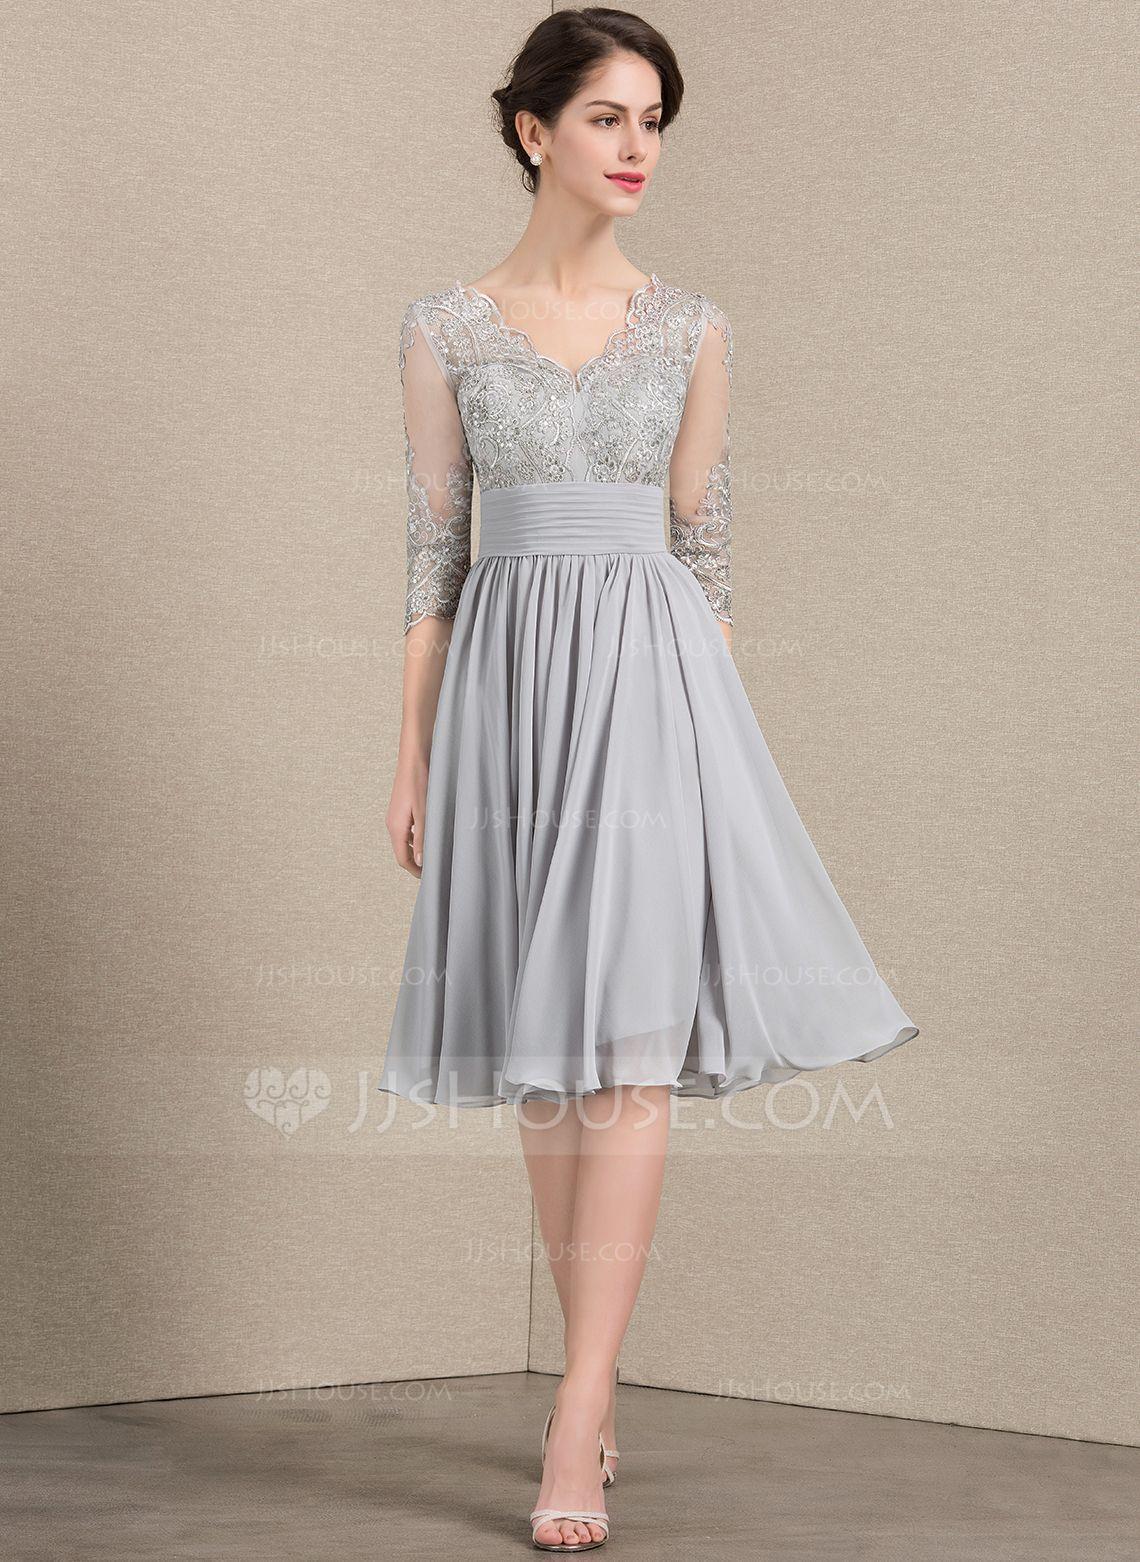 8a5f76a75bc6e A-Line/Princess V-neck Knee-Length Chiffon Lace Mother of the Bride Dress  With Ruffle Sequins (008143372) - Mother of the Bride Dresses - JJsHouse